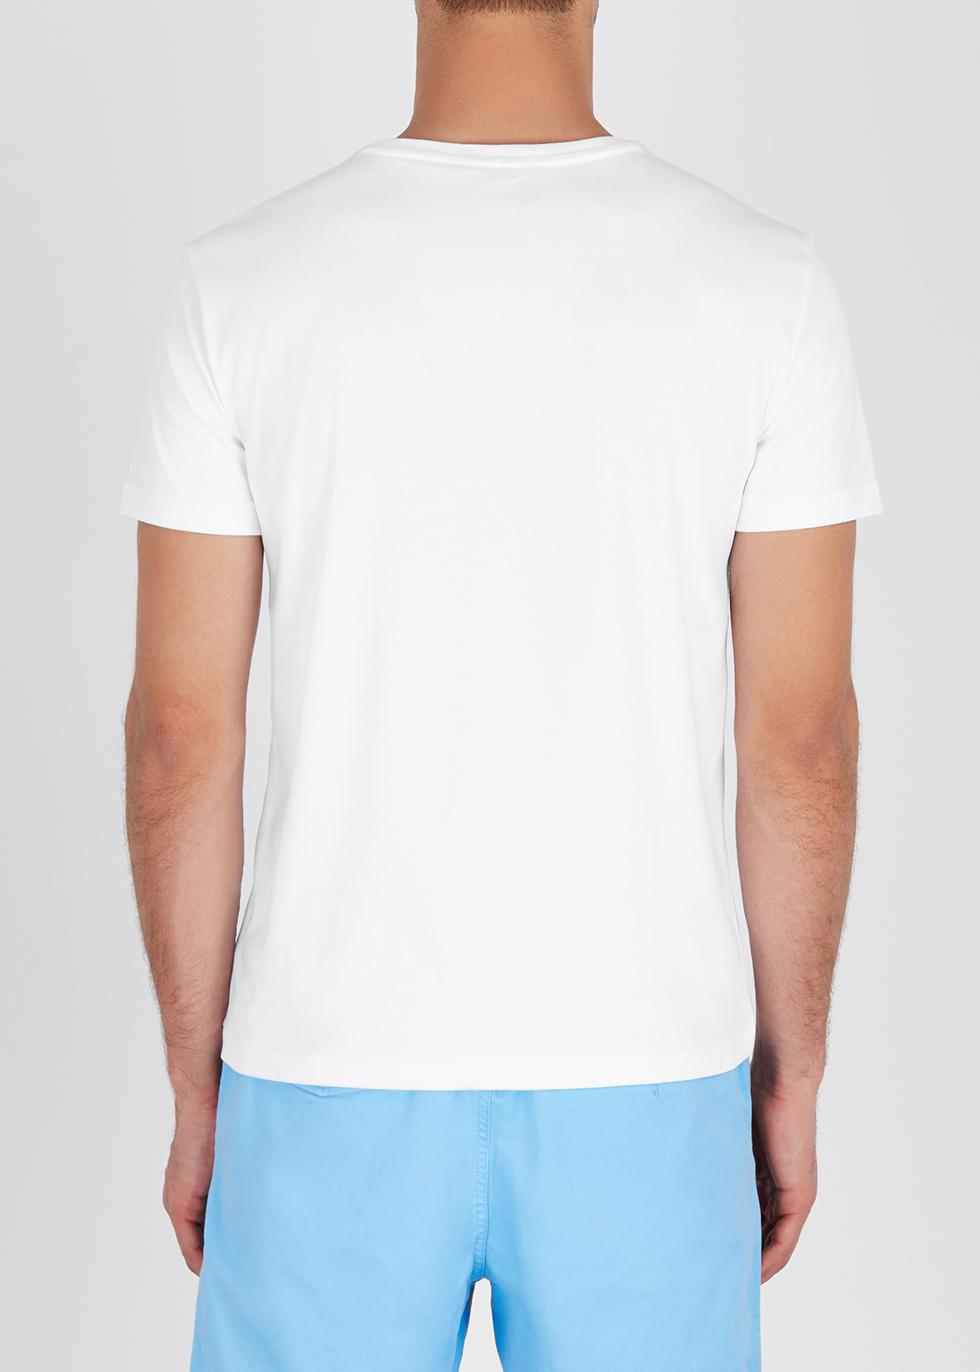 White Pima cotton T-shirt - Polo Ralph Lauren